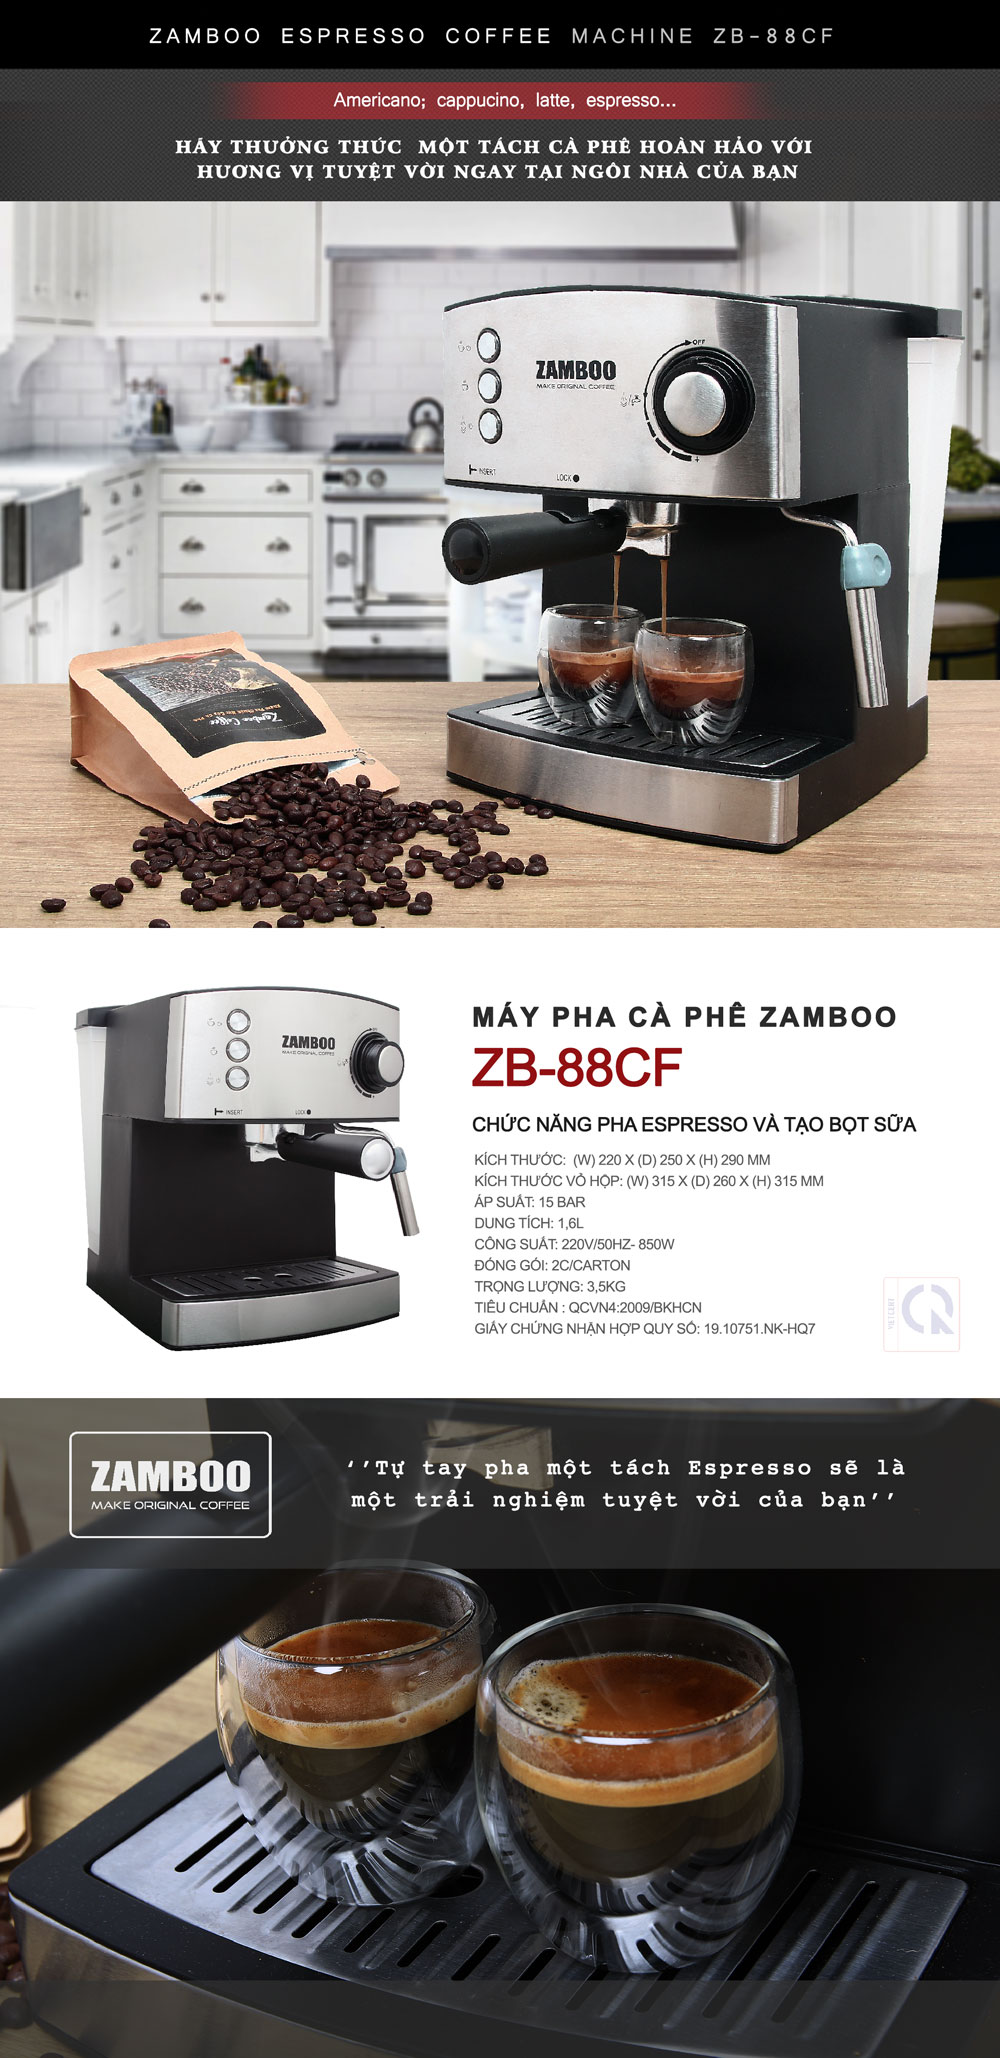 ZAMBOO ZB 88CF